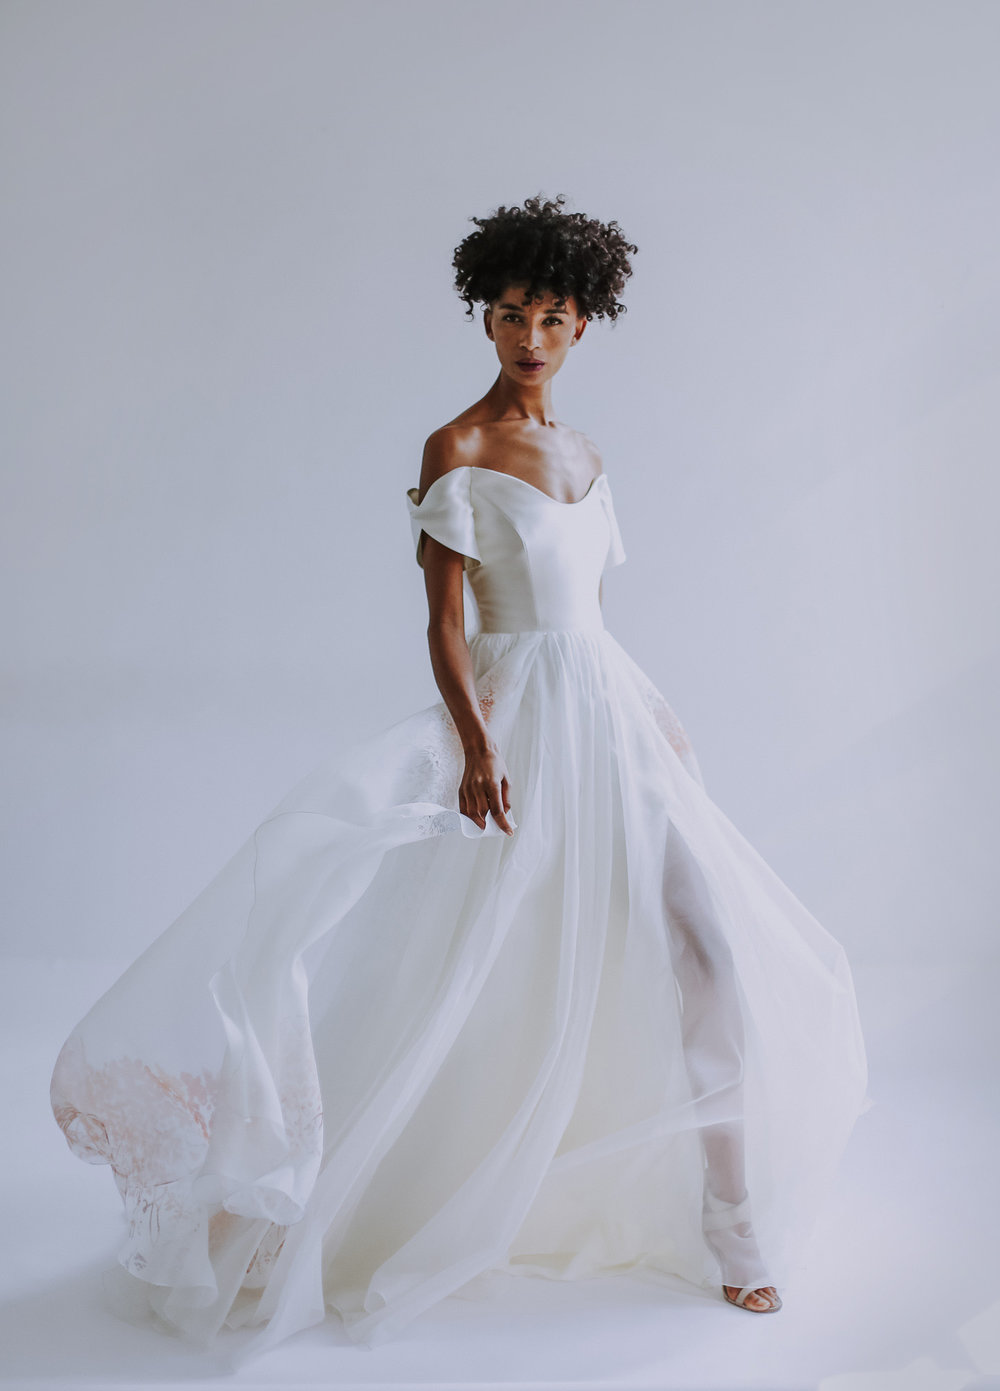 leanne-marshall-wedding-gown-5.jpg